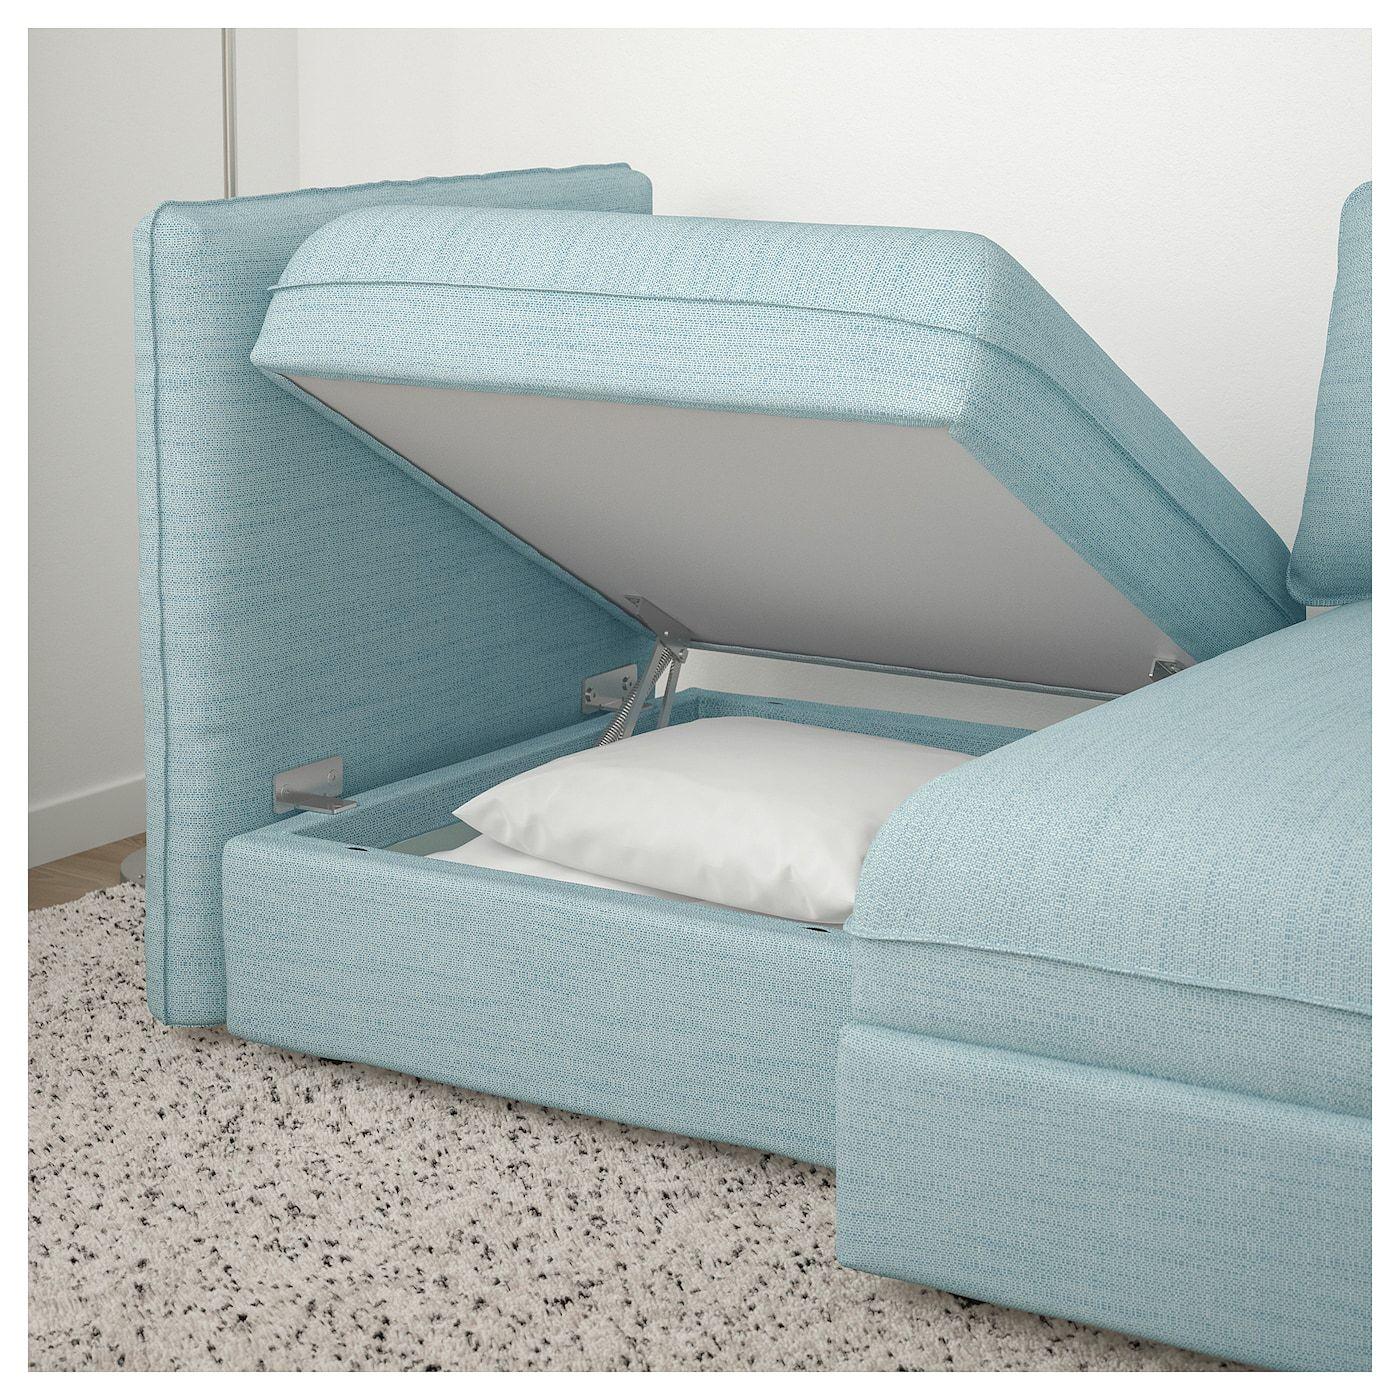 Vallentuna Modular Loveseat With Storage Hillared Light Blue Flexible Furniture Modular Sofa Love Seat